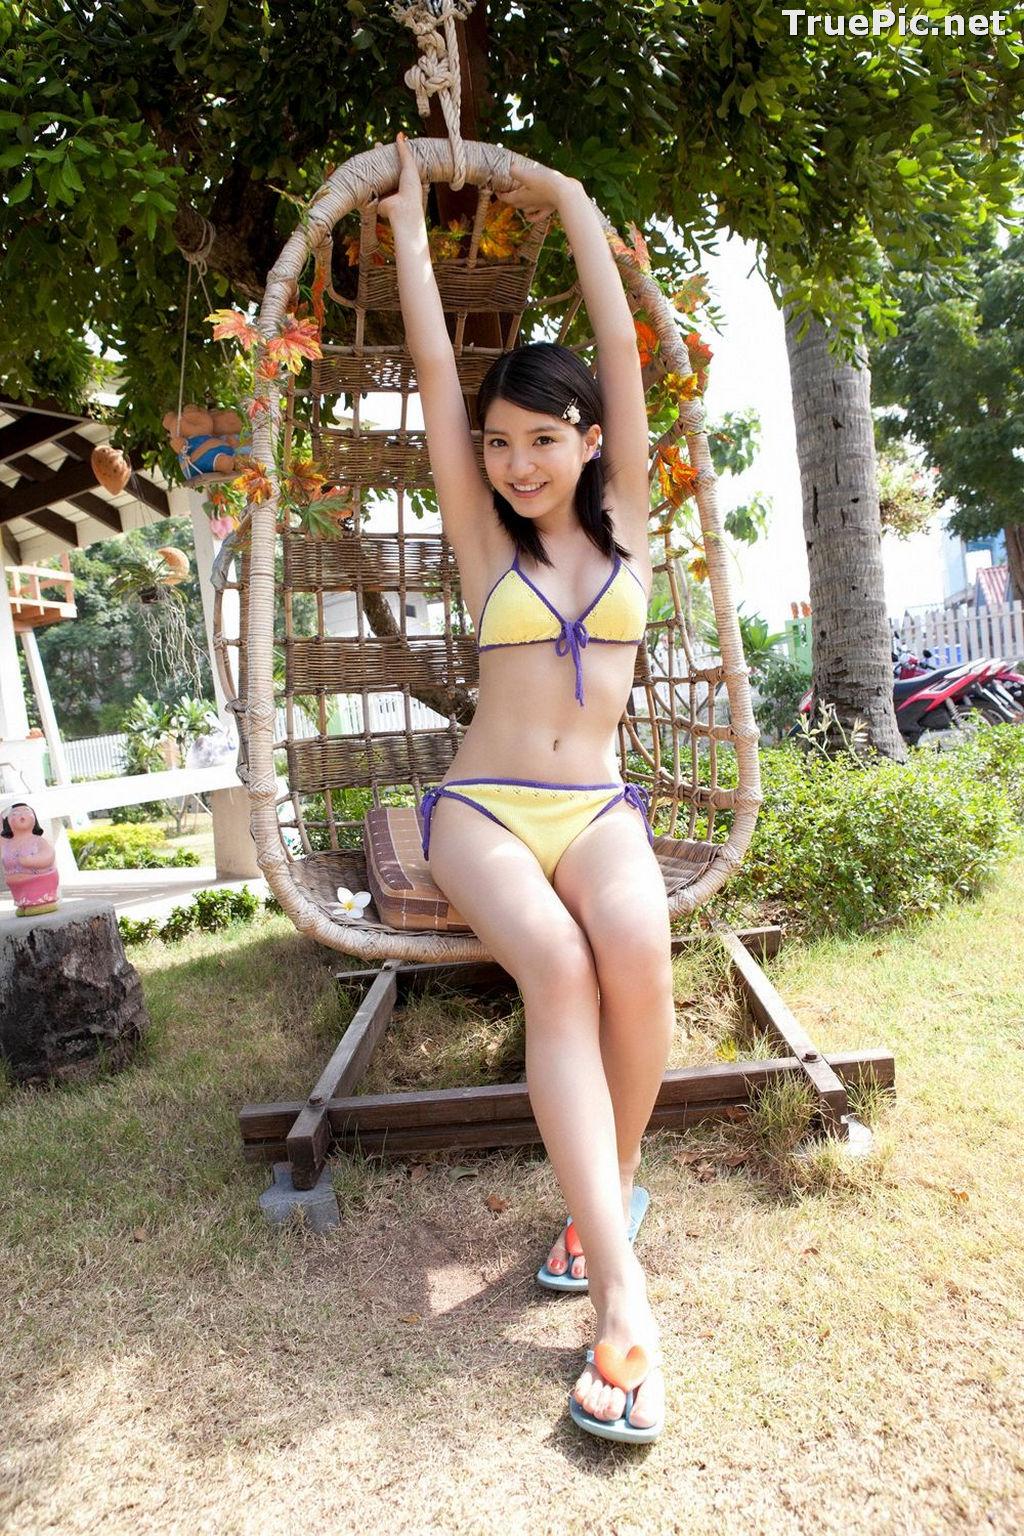 Image [YS Web] Vol.506 - Japanese Actress and Singer - Umika Kawashima - TruePic.net - Picture-18